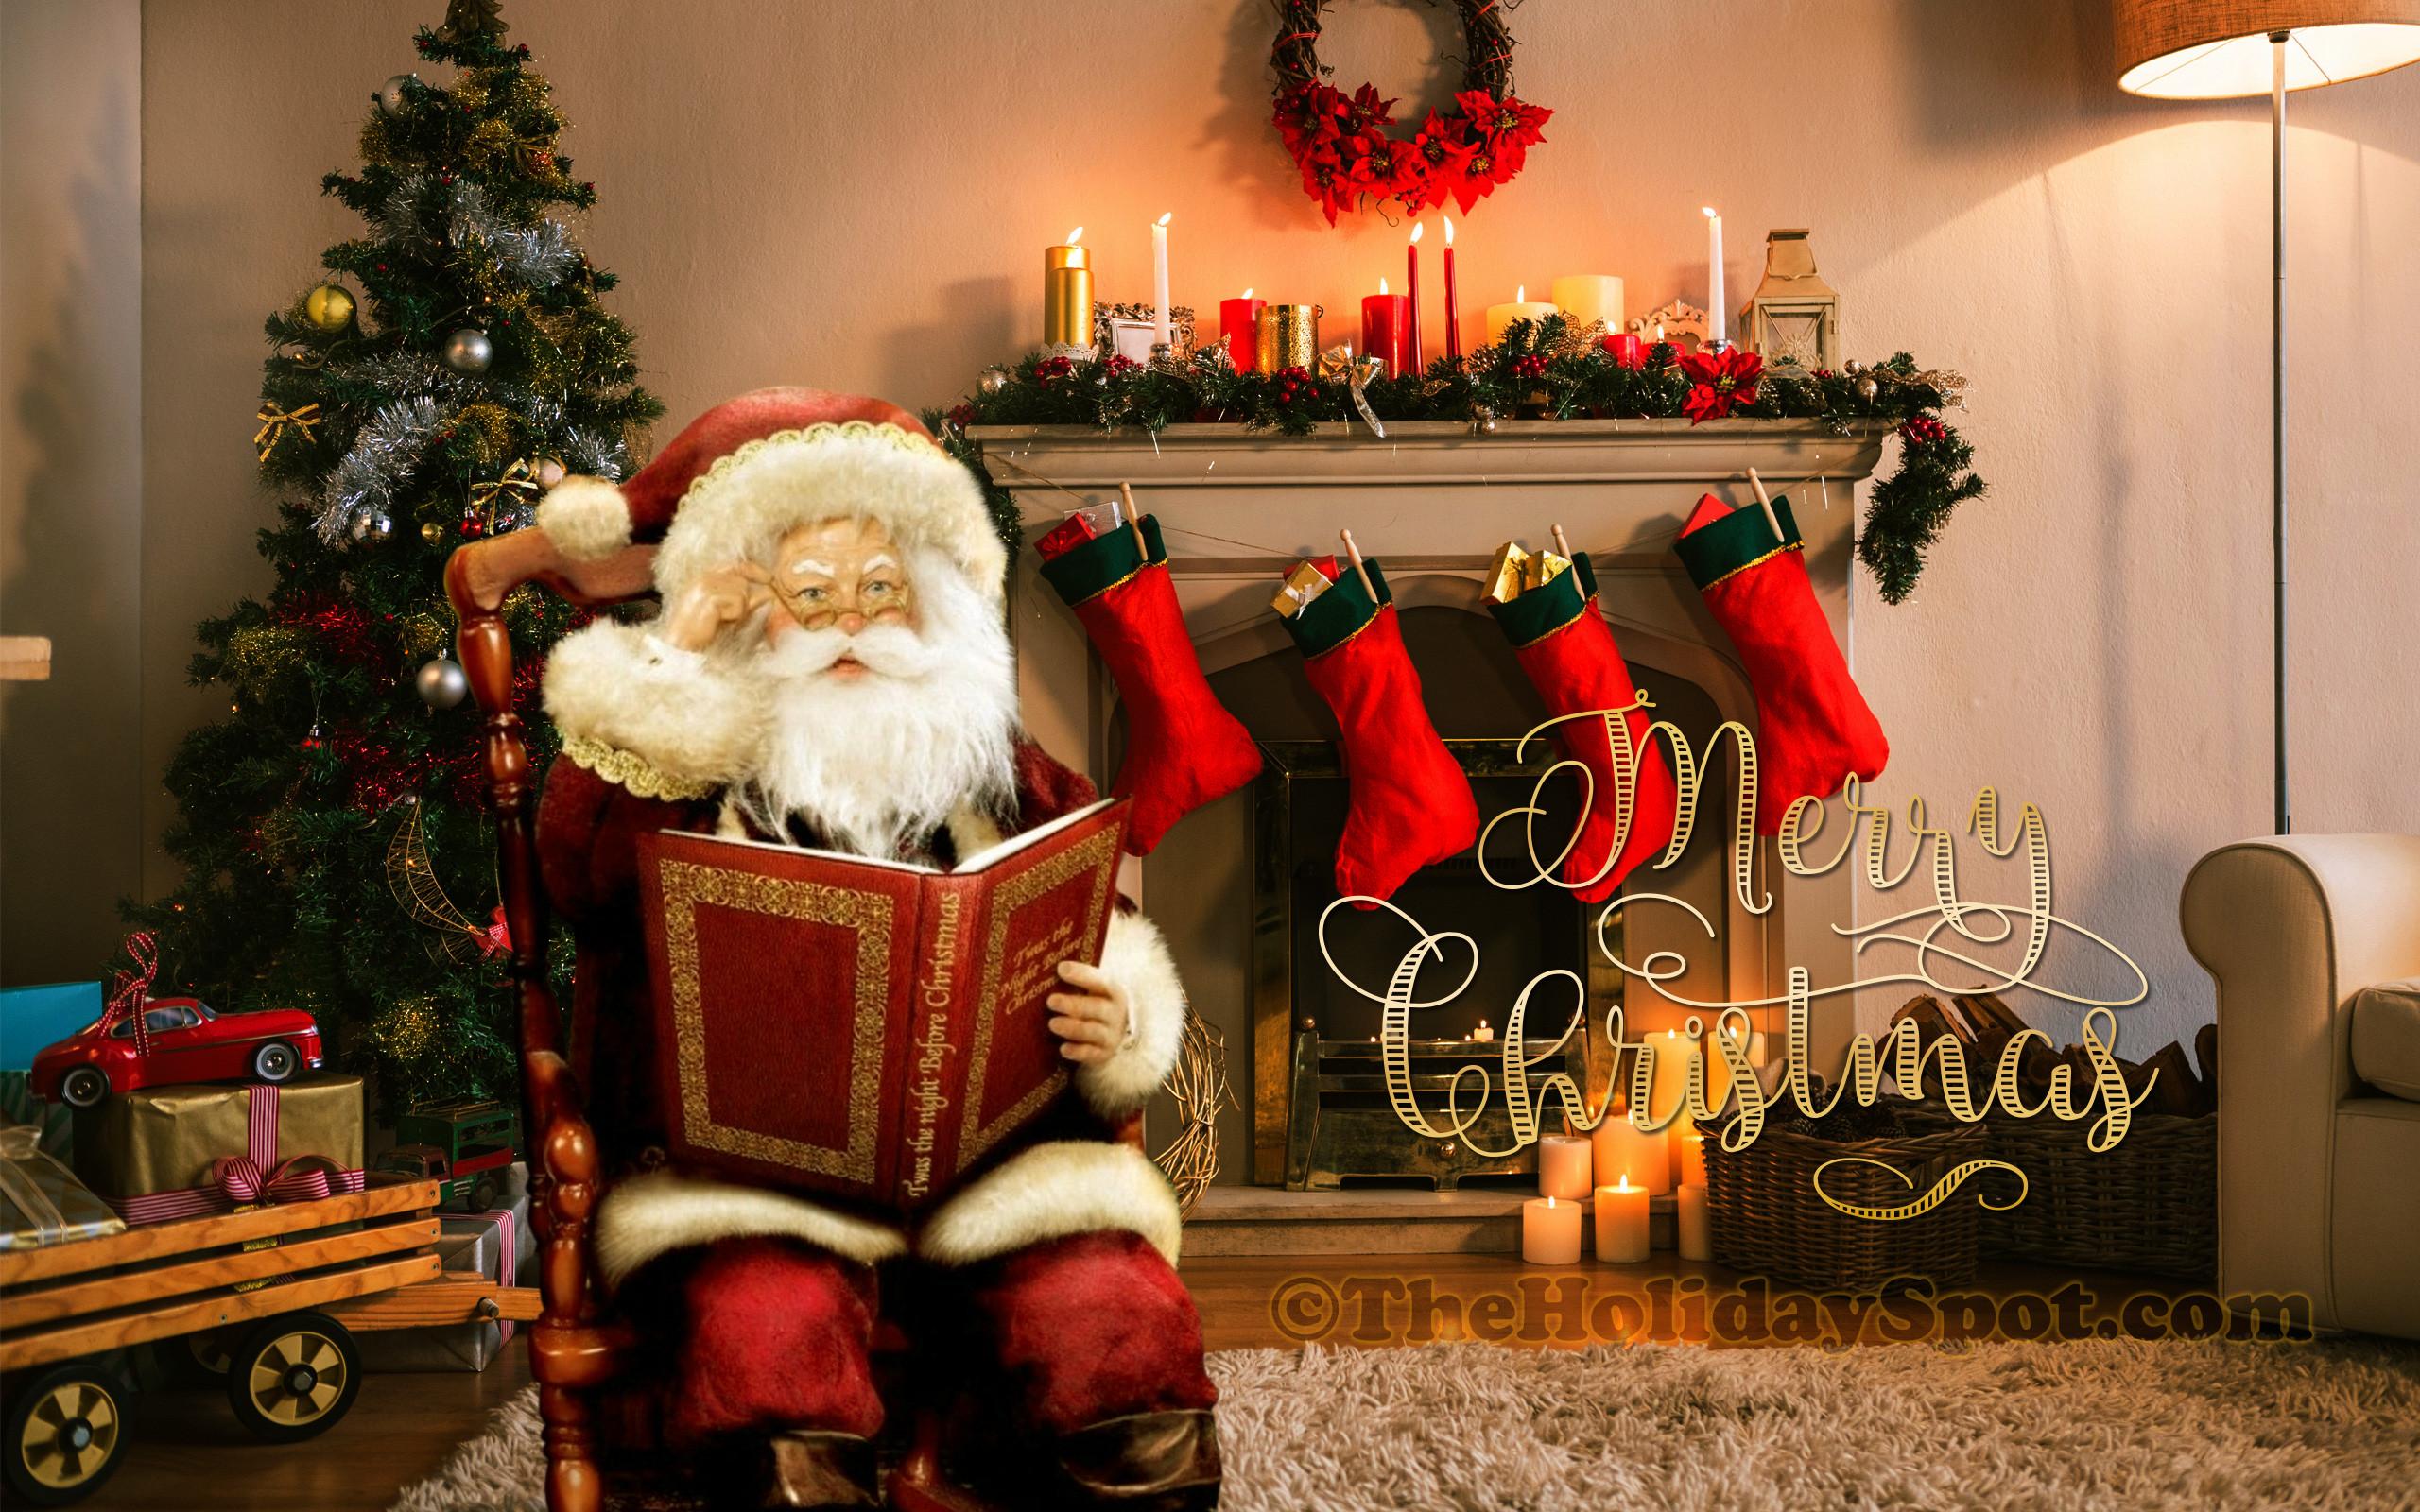 Christmas Wallpaper For Desktop 61 Images